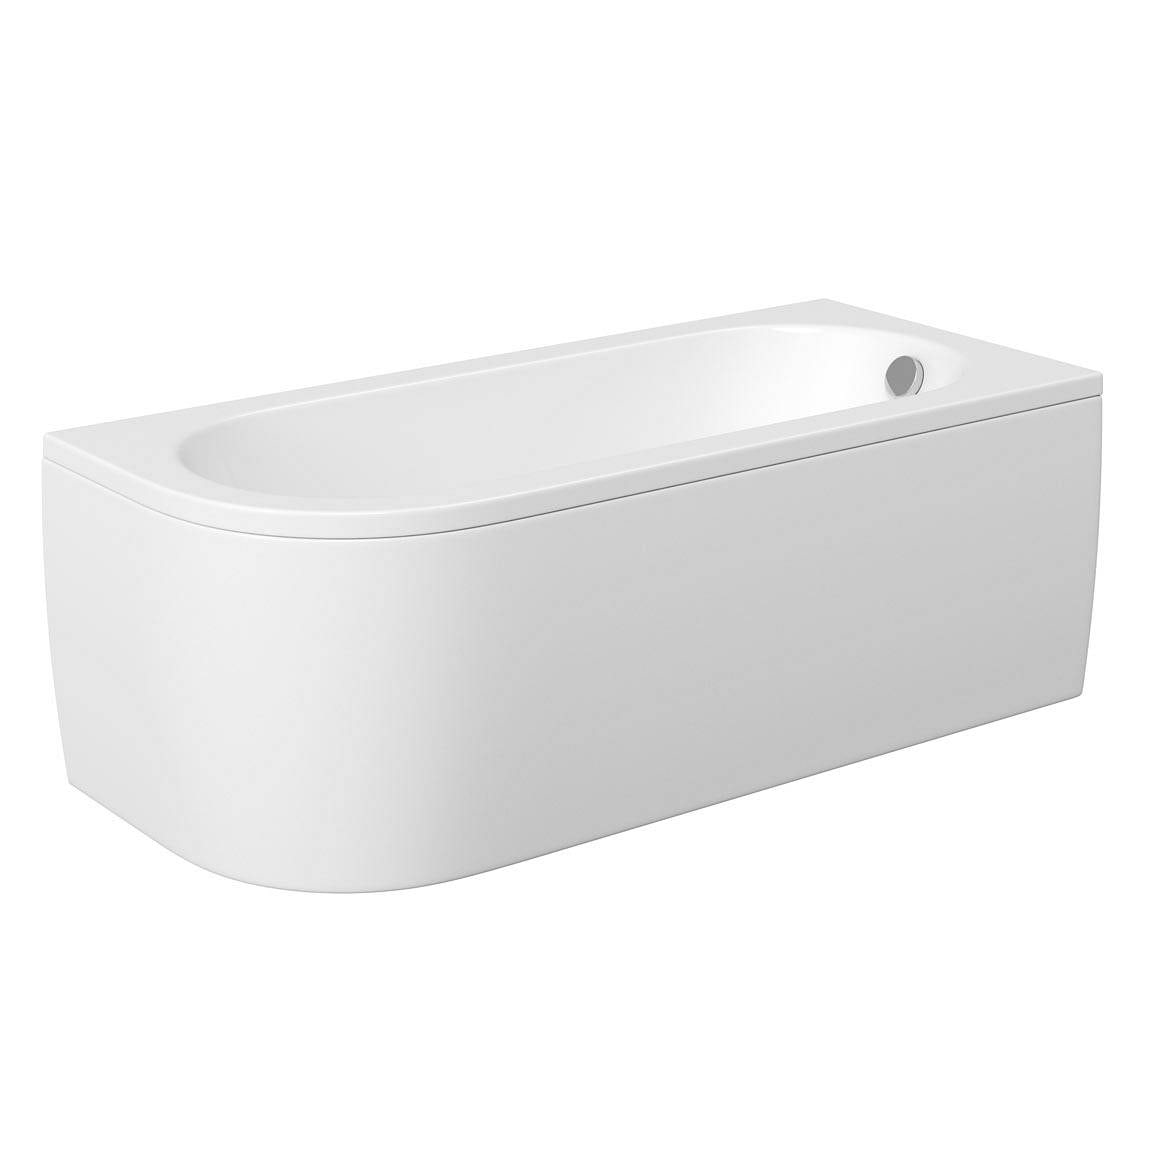 Orchard Elsdon D shaped right handed single ended bath